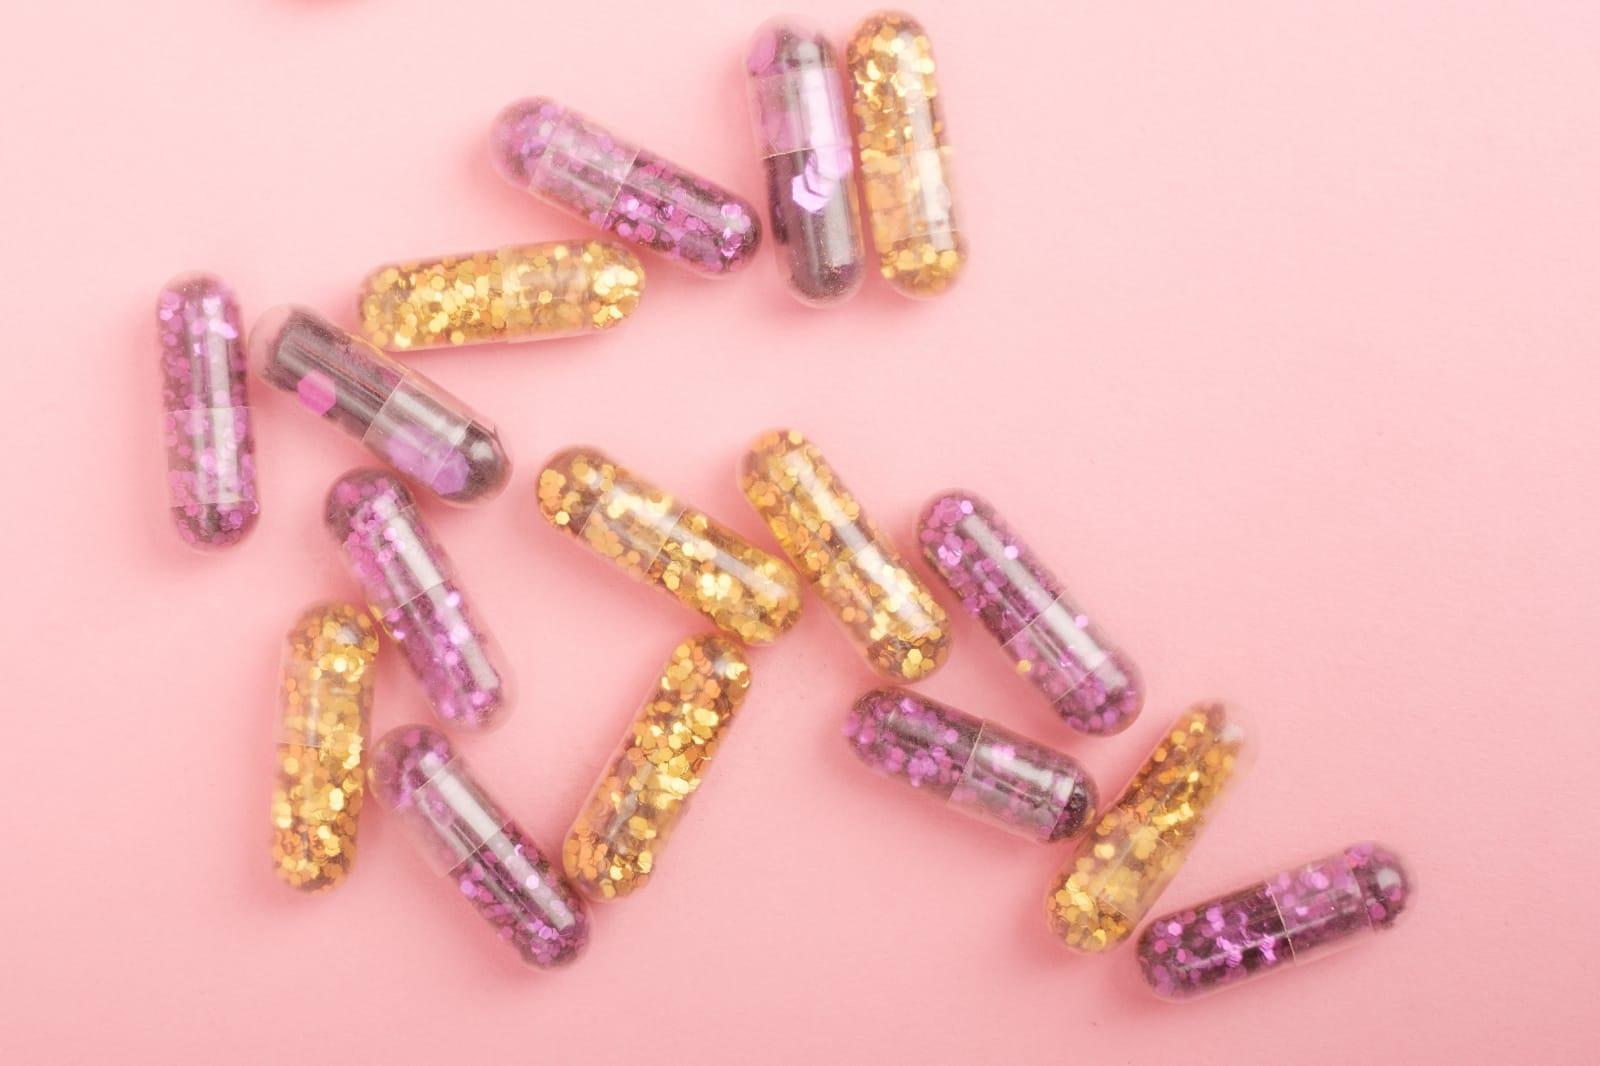 manfaat glycolic acid untuk kecantikan (2)